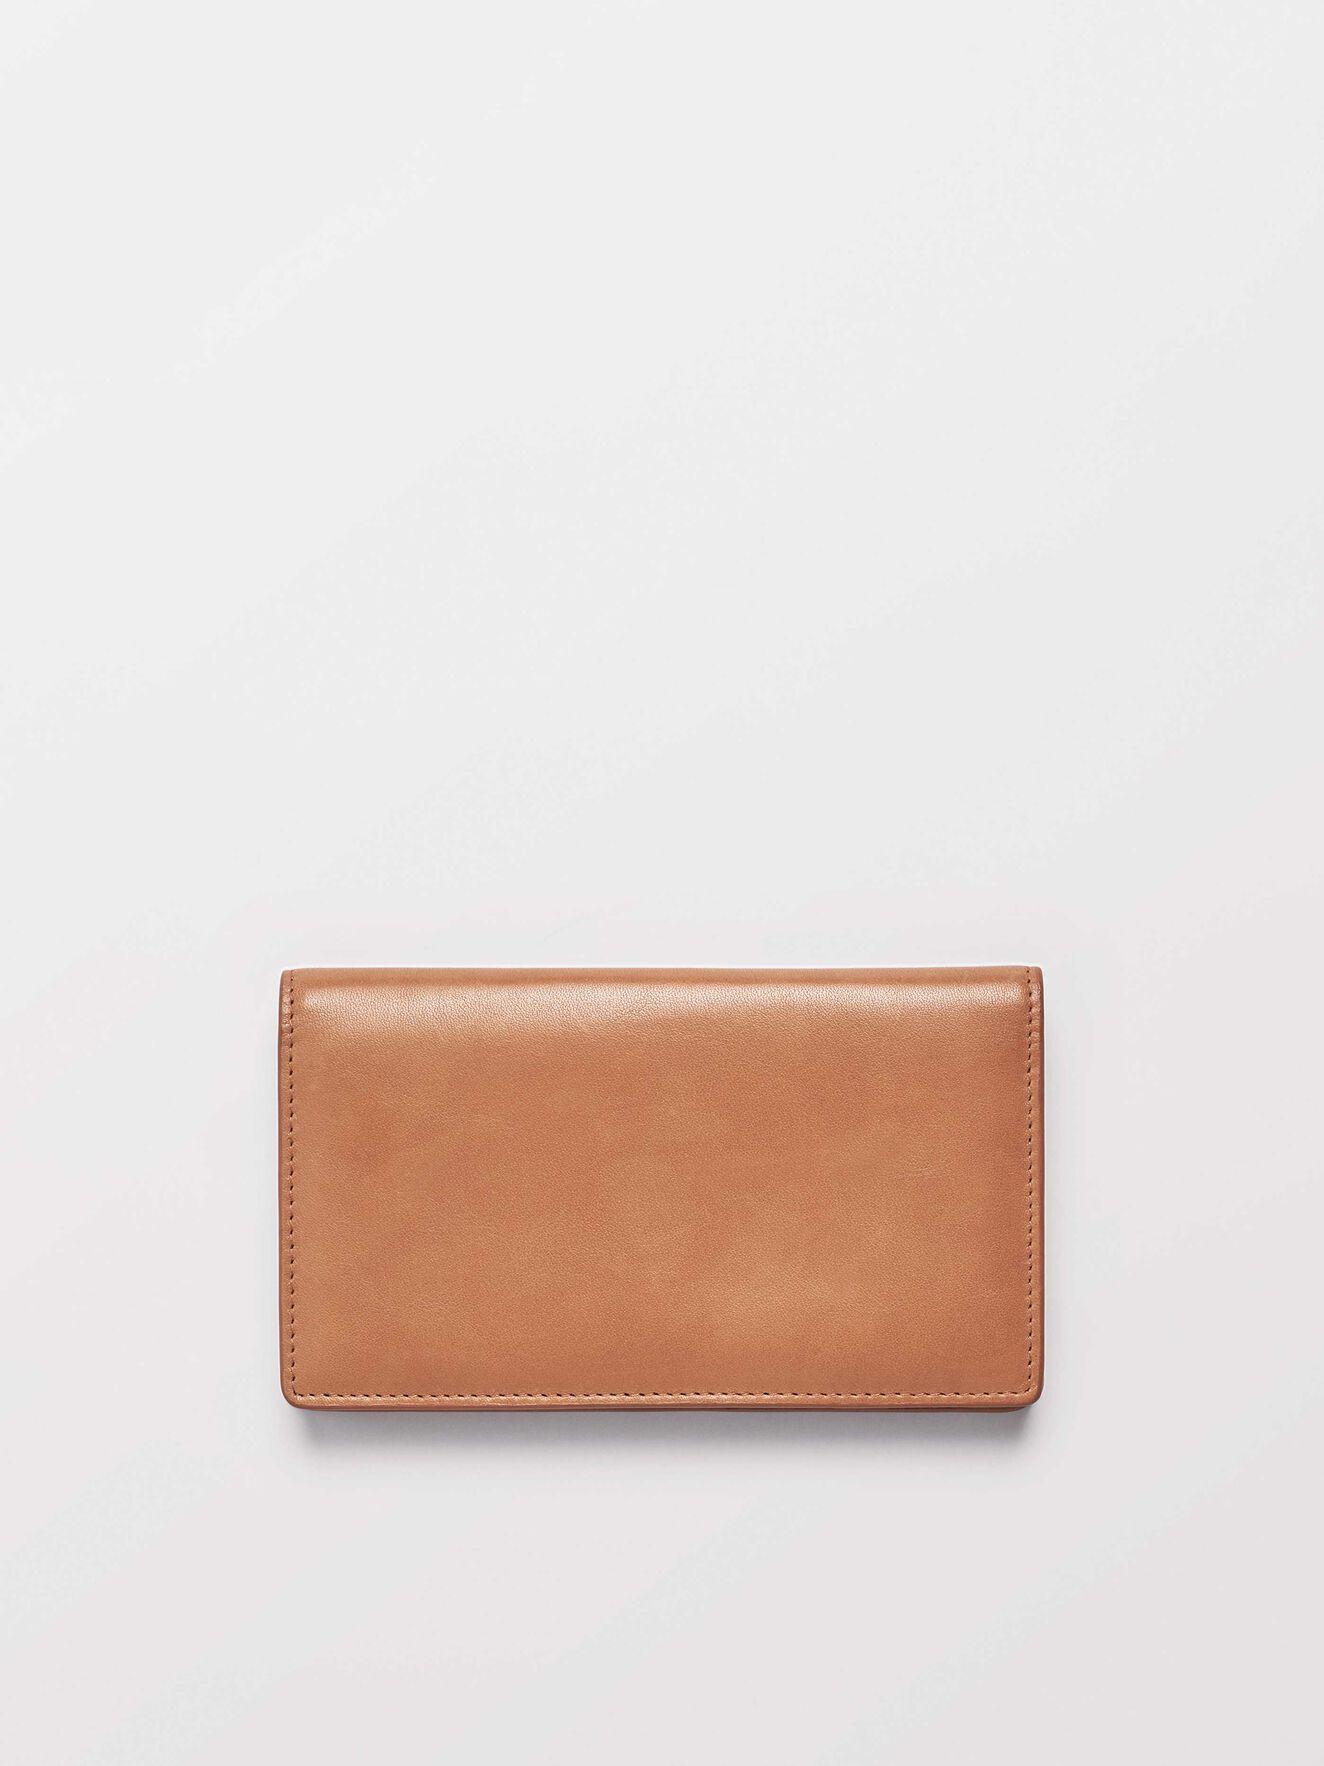 Stilpai Wallet in Cognac from Tiger of Sweden